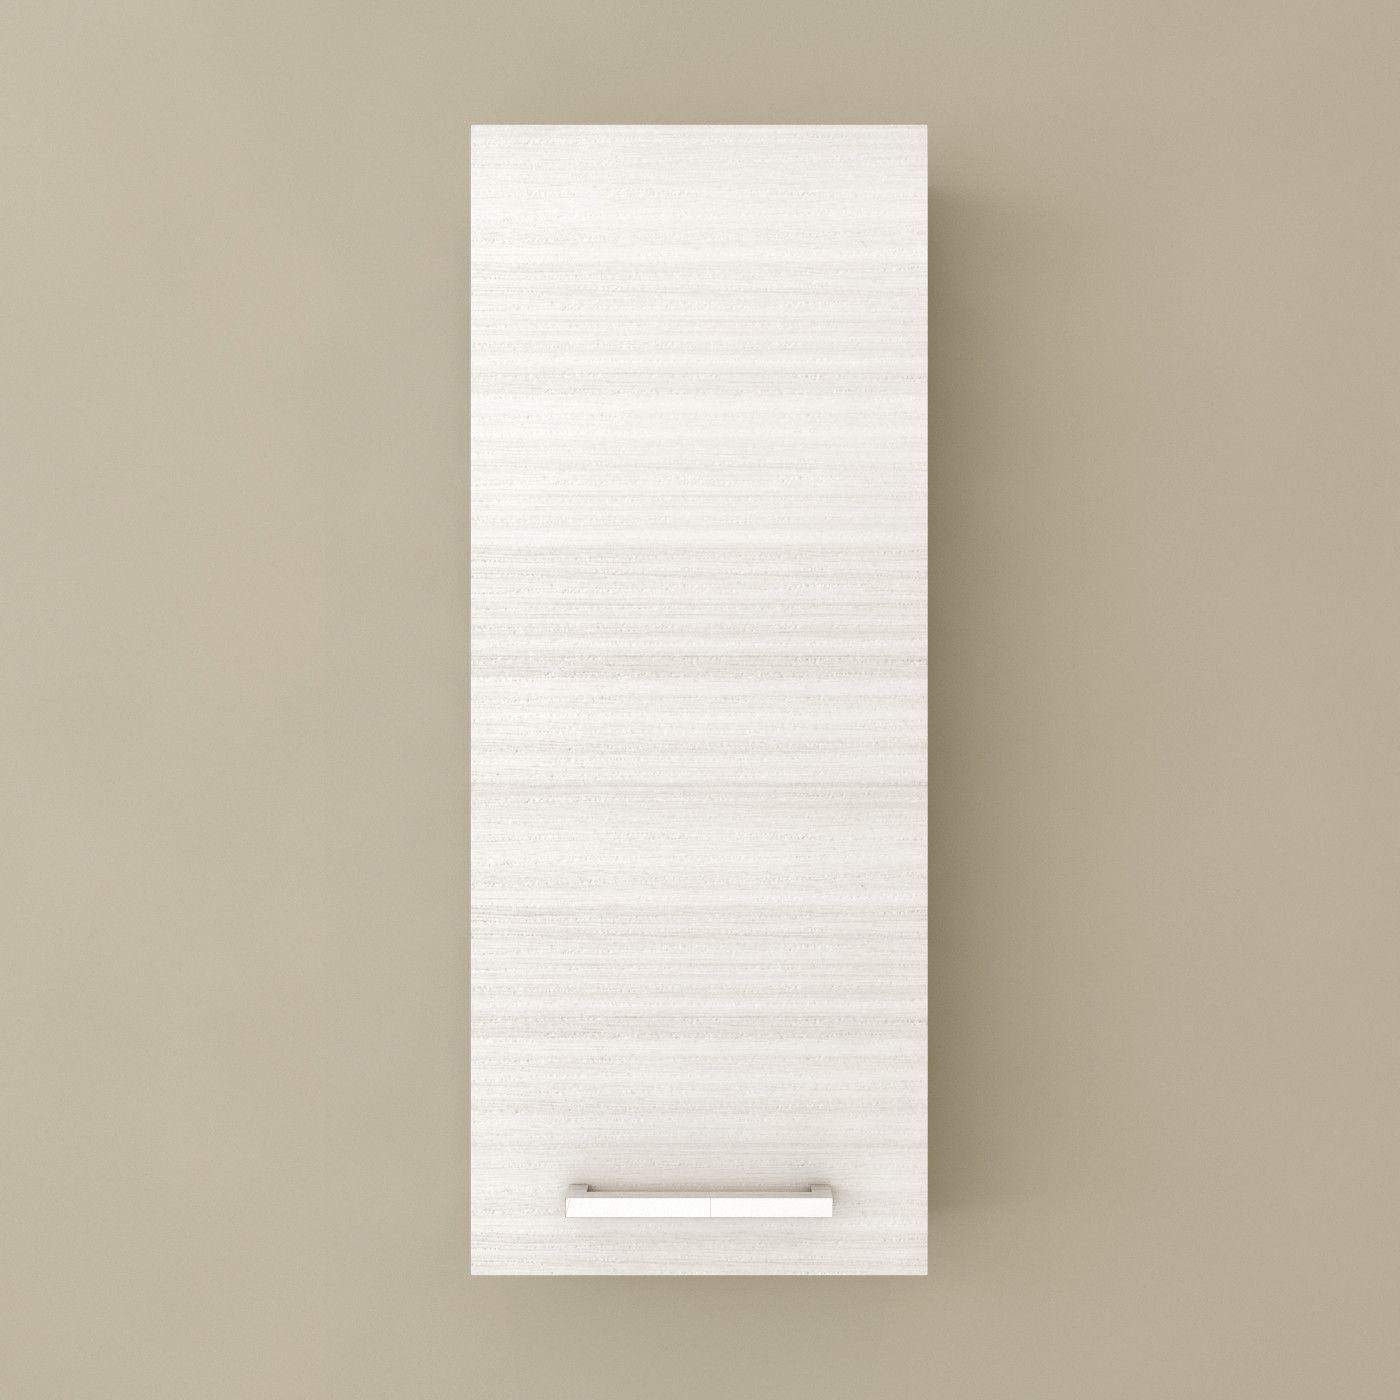 "Cutler Kitchen & Bath Silhouette 11.5"" x 30.75"" Wall Mounted Cabinet & Reviews | Wayfair"